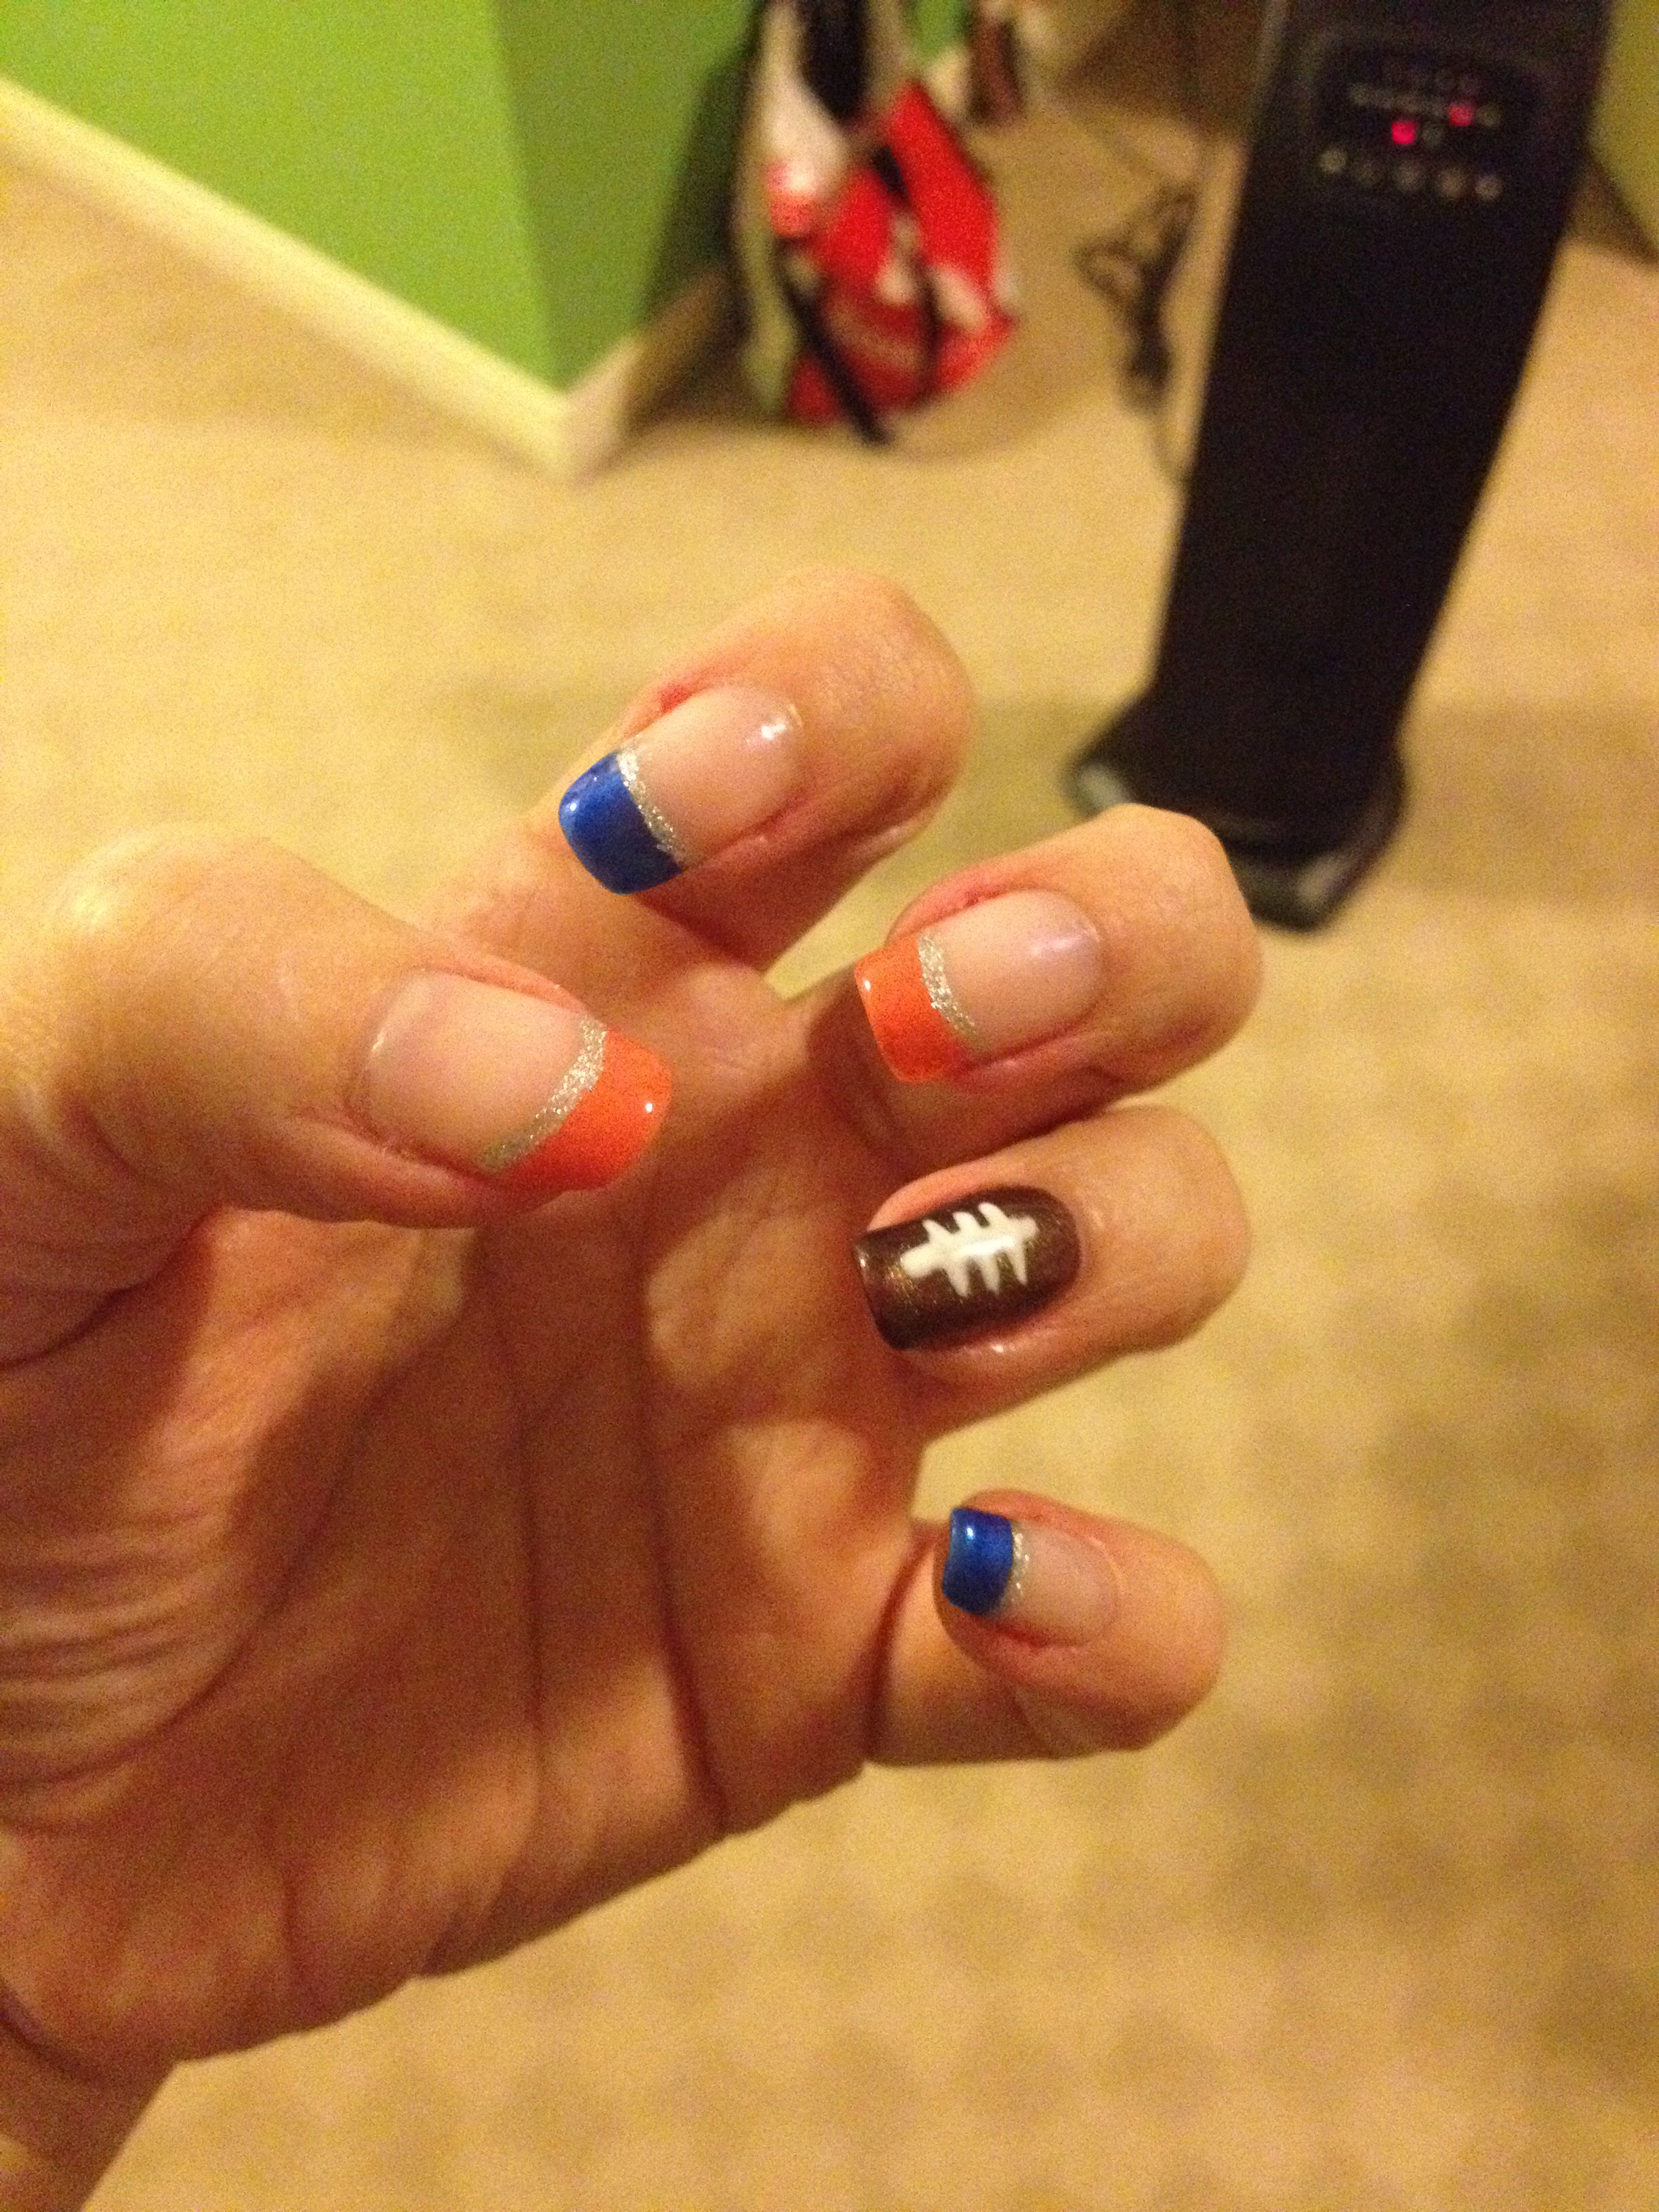 Denver Broncos nails   Nails   Pinterest   Denver broncos nails ...